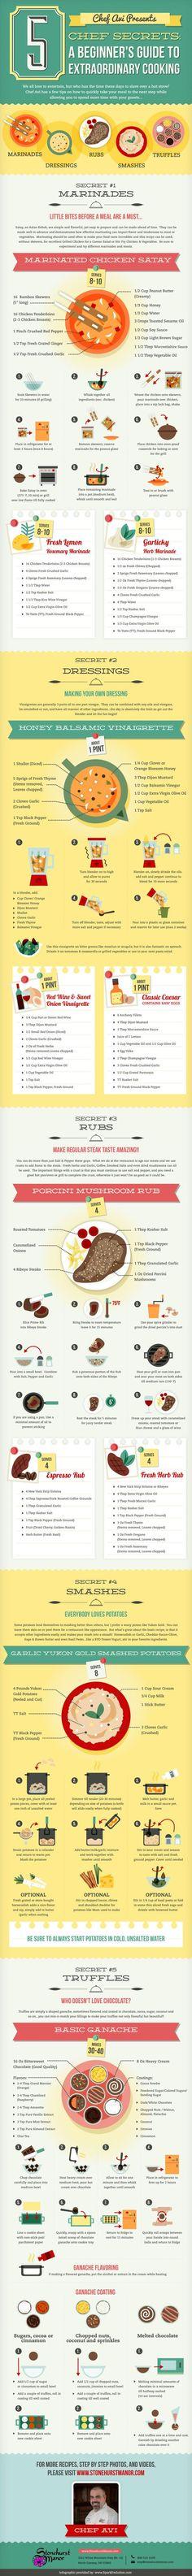 Diy Secrets For Extraordinary Cooking